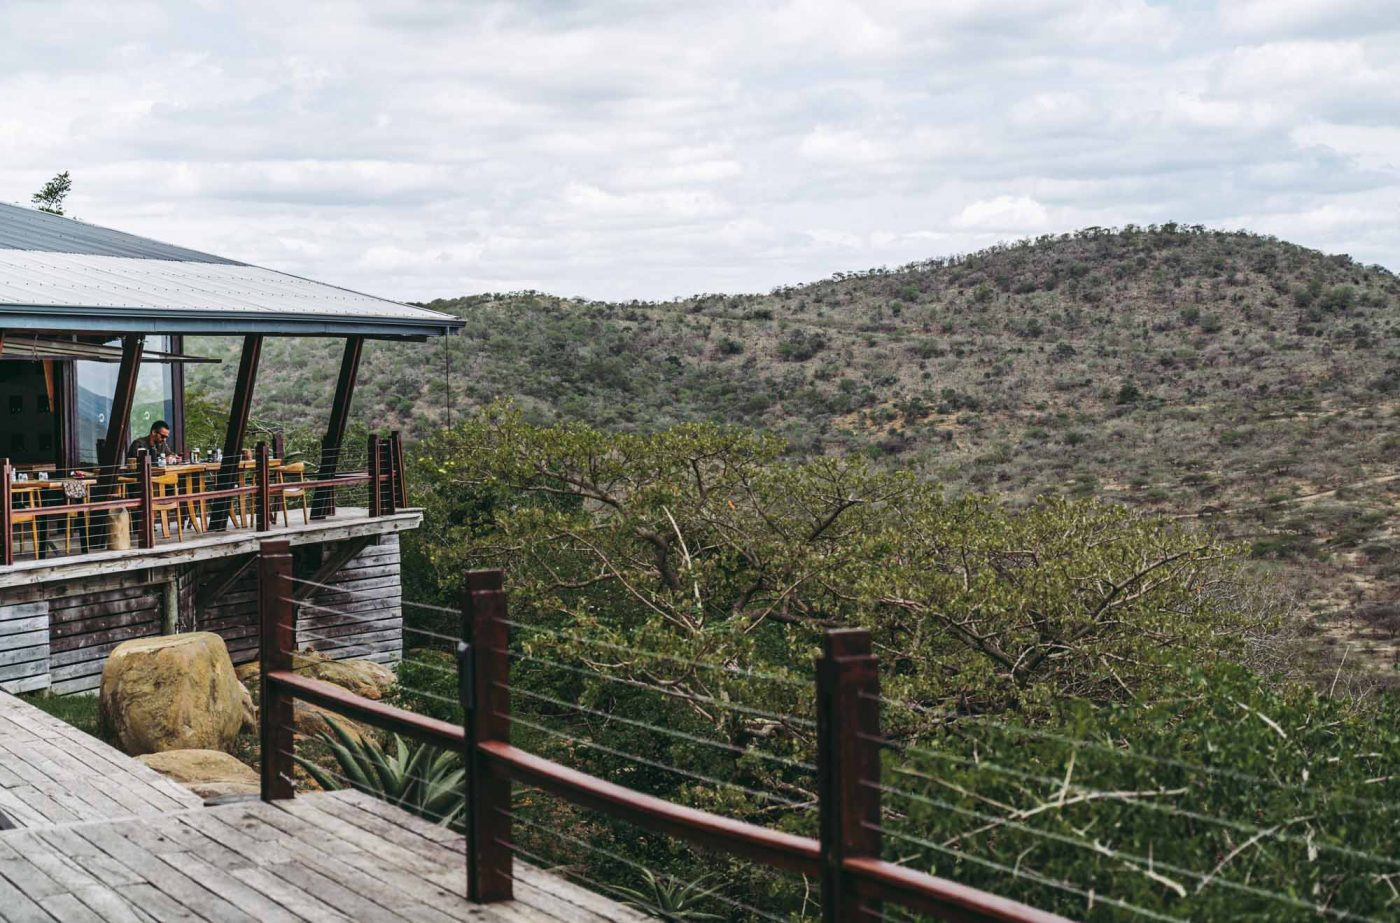 The deck at Rhino Ridge Safari Lodge in Hluhluwe iMfolozi National Park